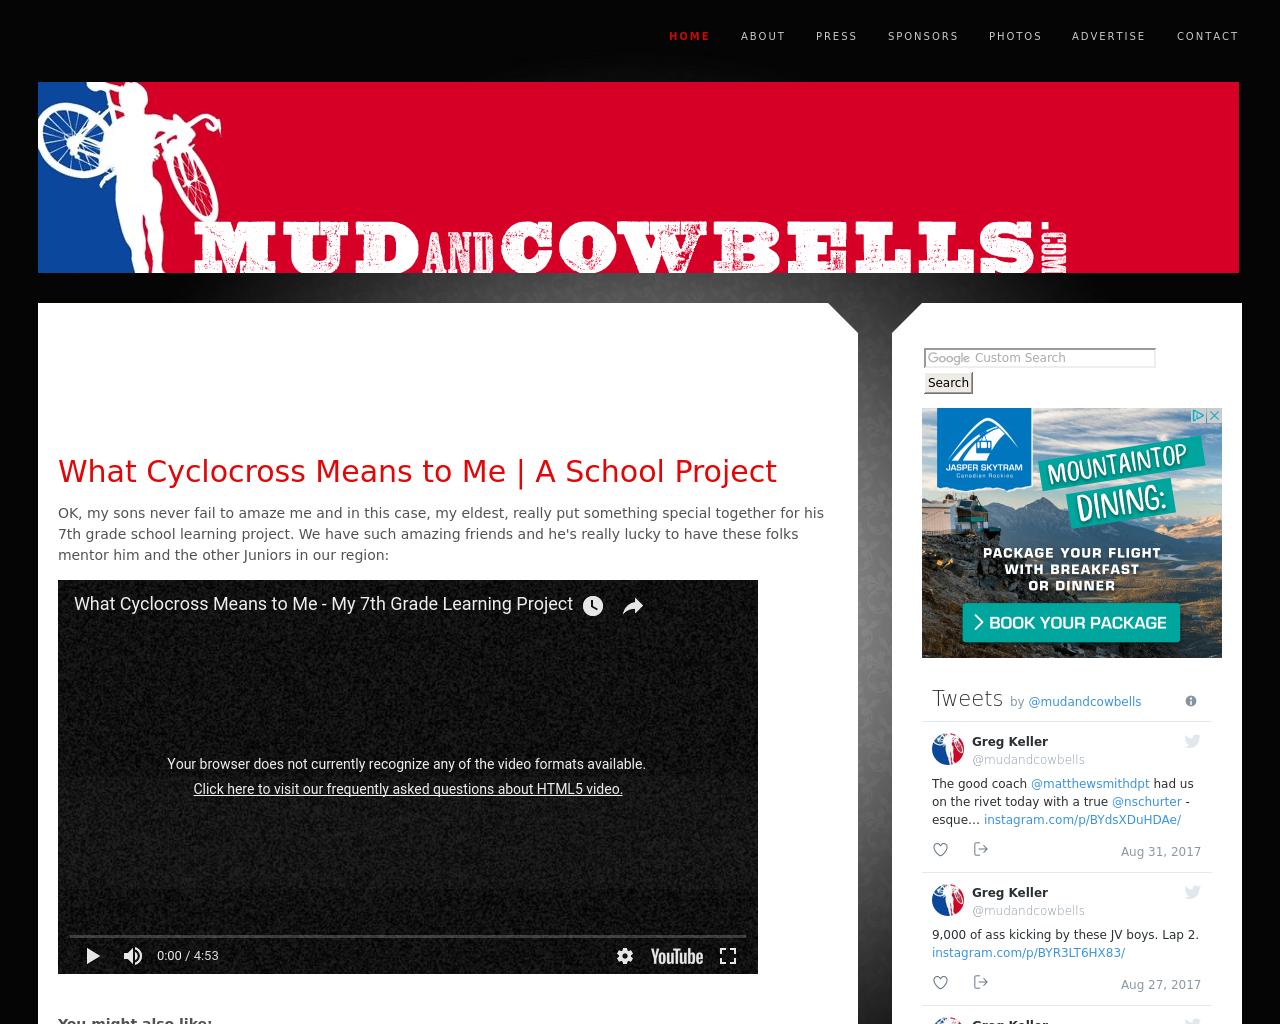 Mud-And-Cowbells-Advertising-Reviews-Pricing